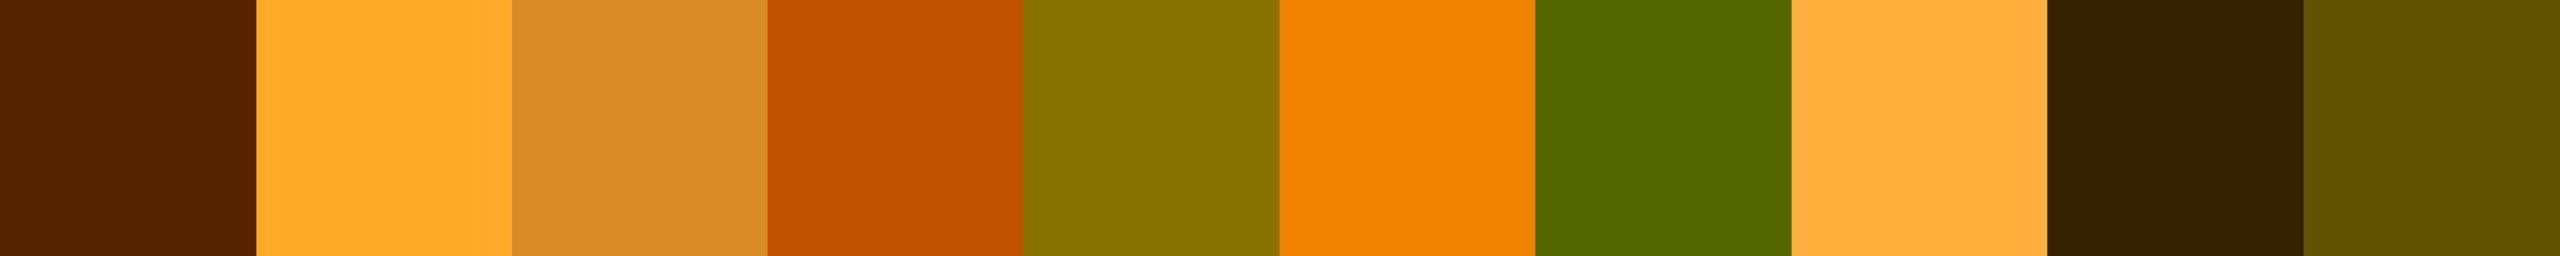 5 Rokemia Color Palette